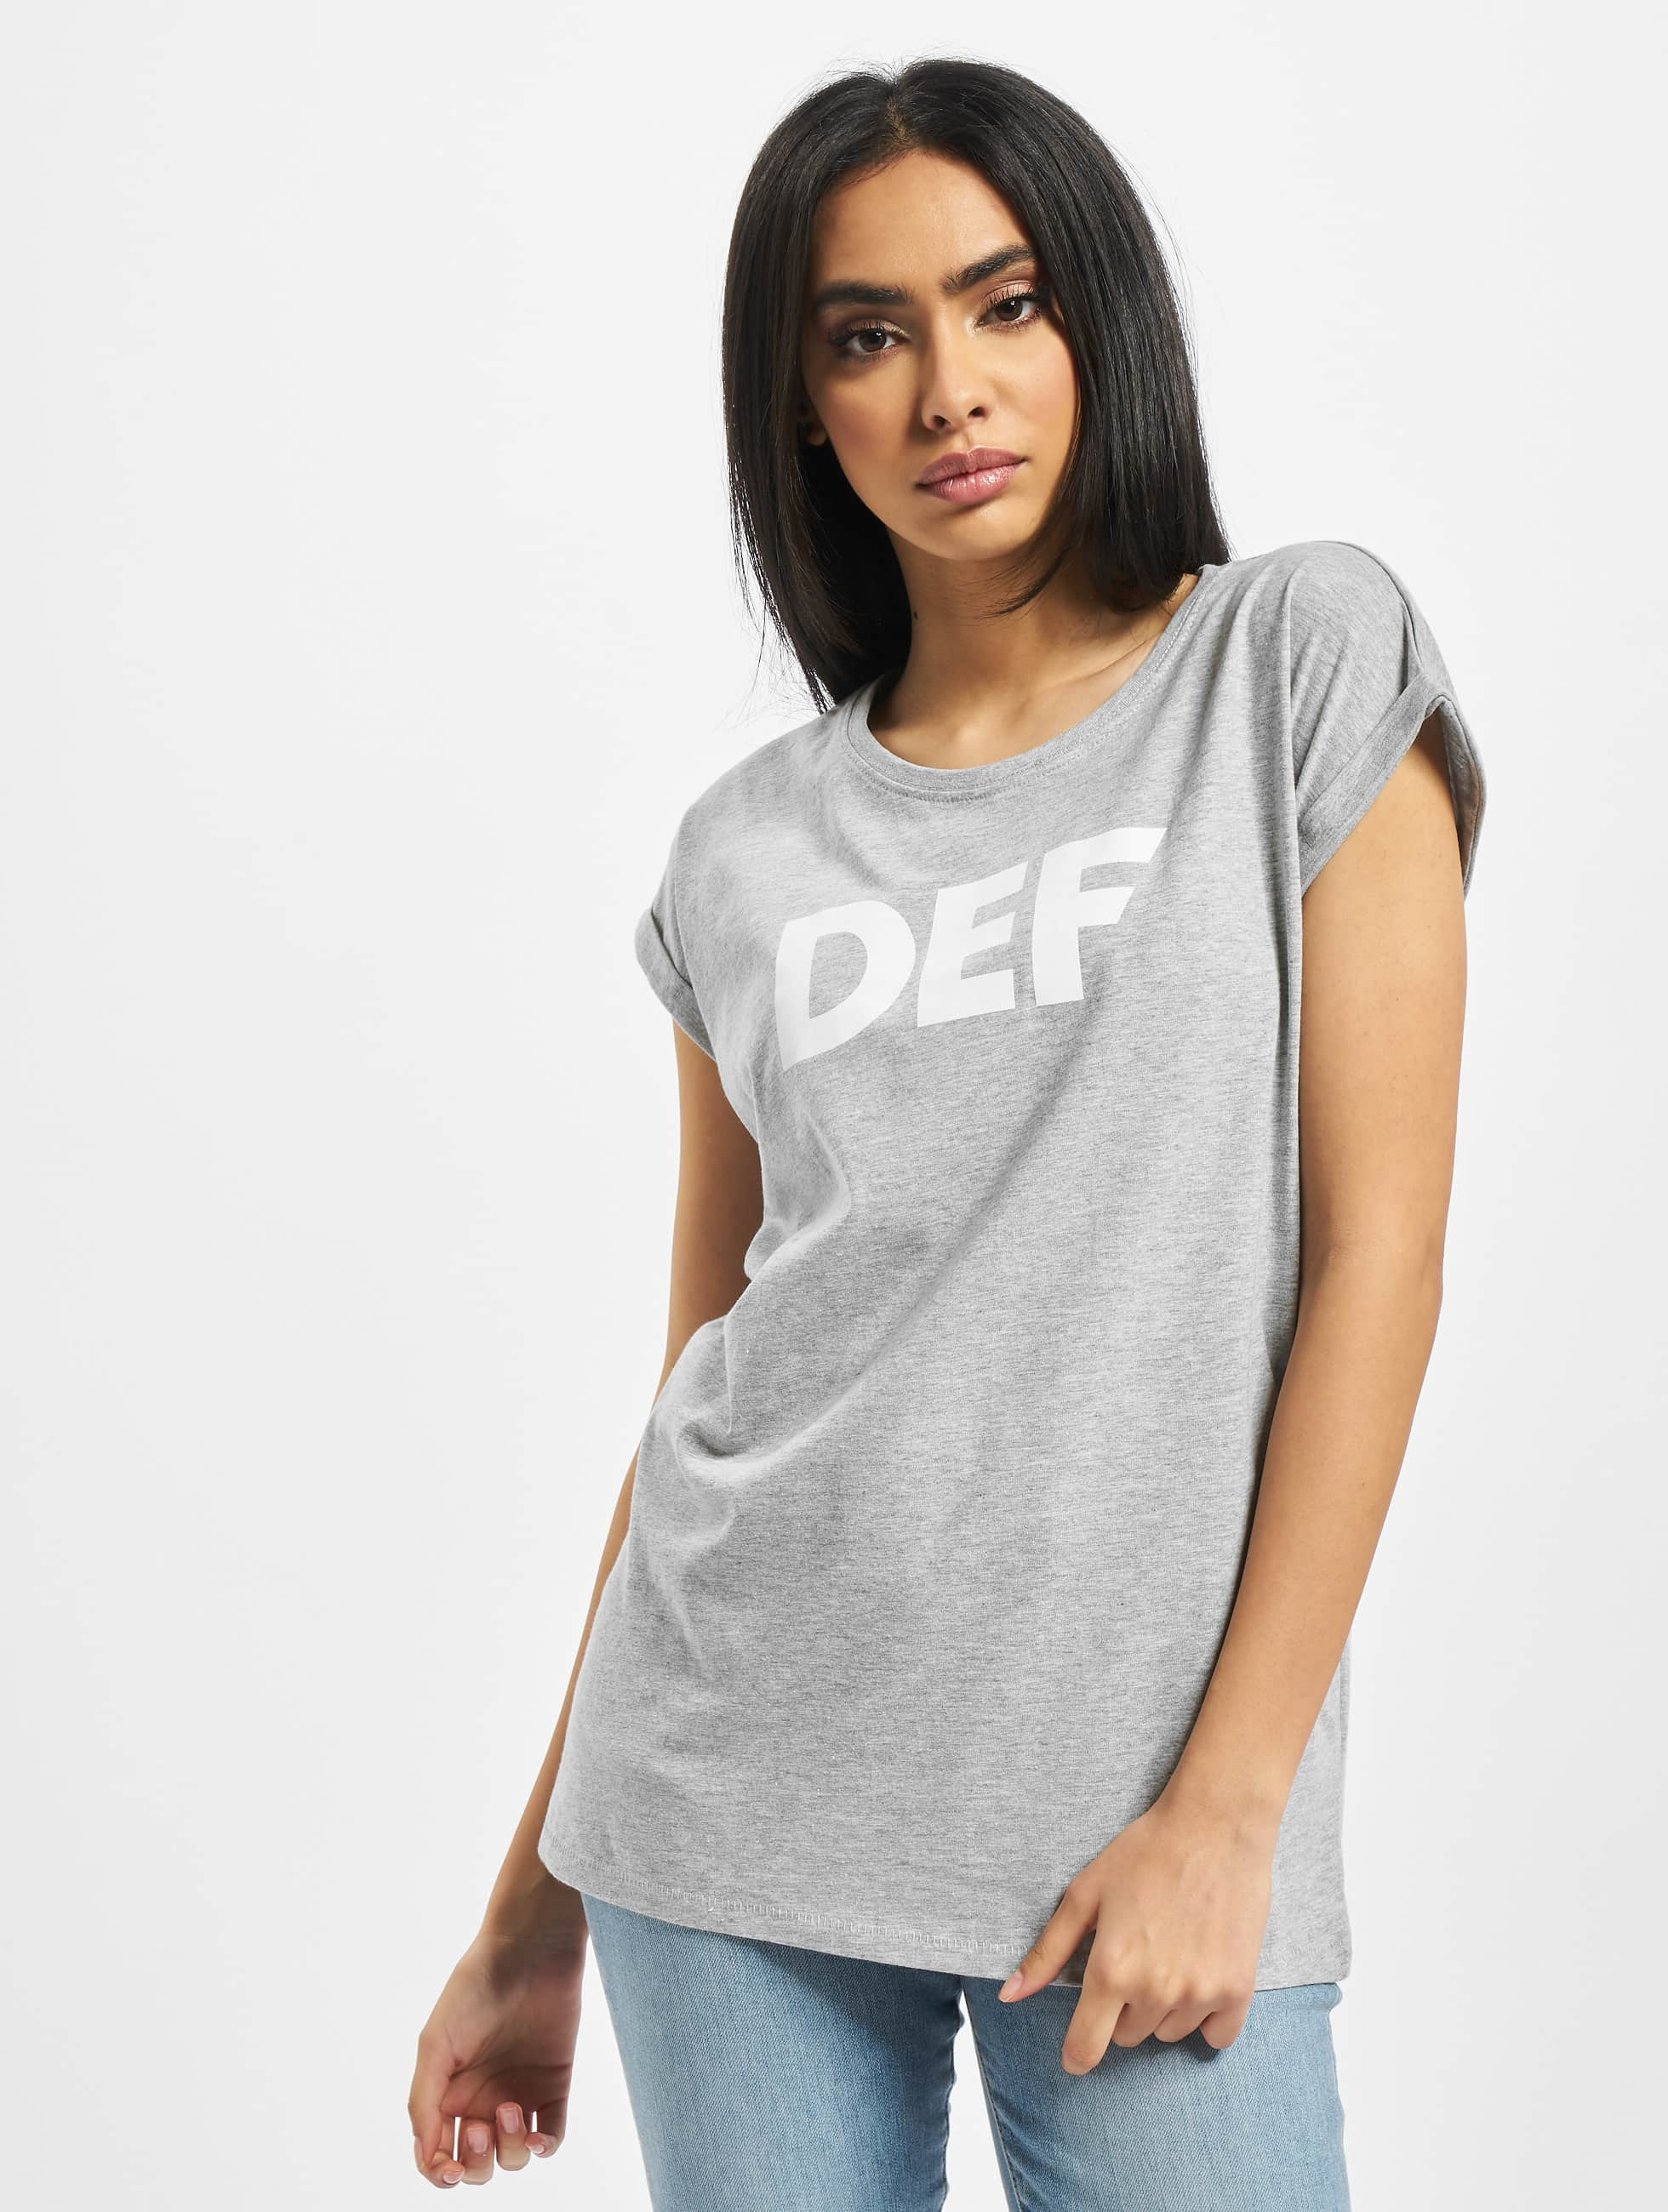 DEF / T-Shirt Sizza in grey XS